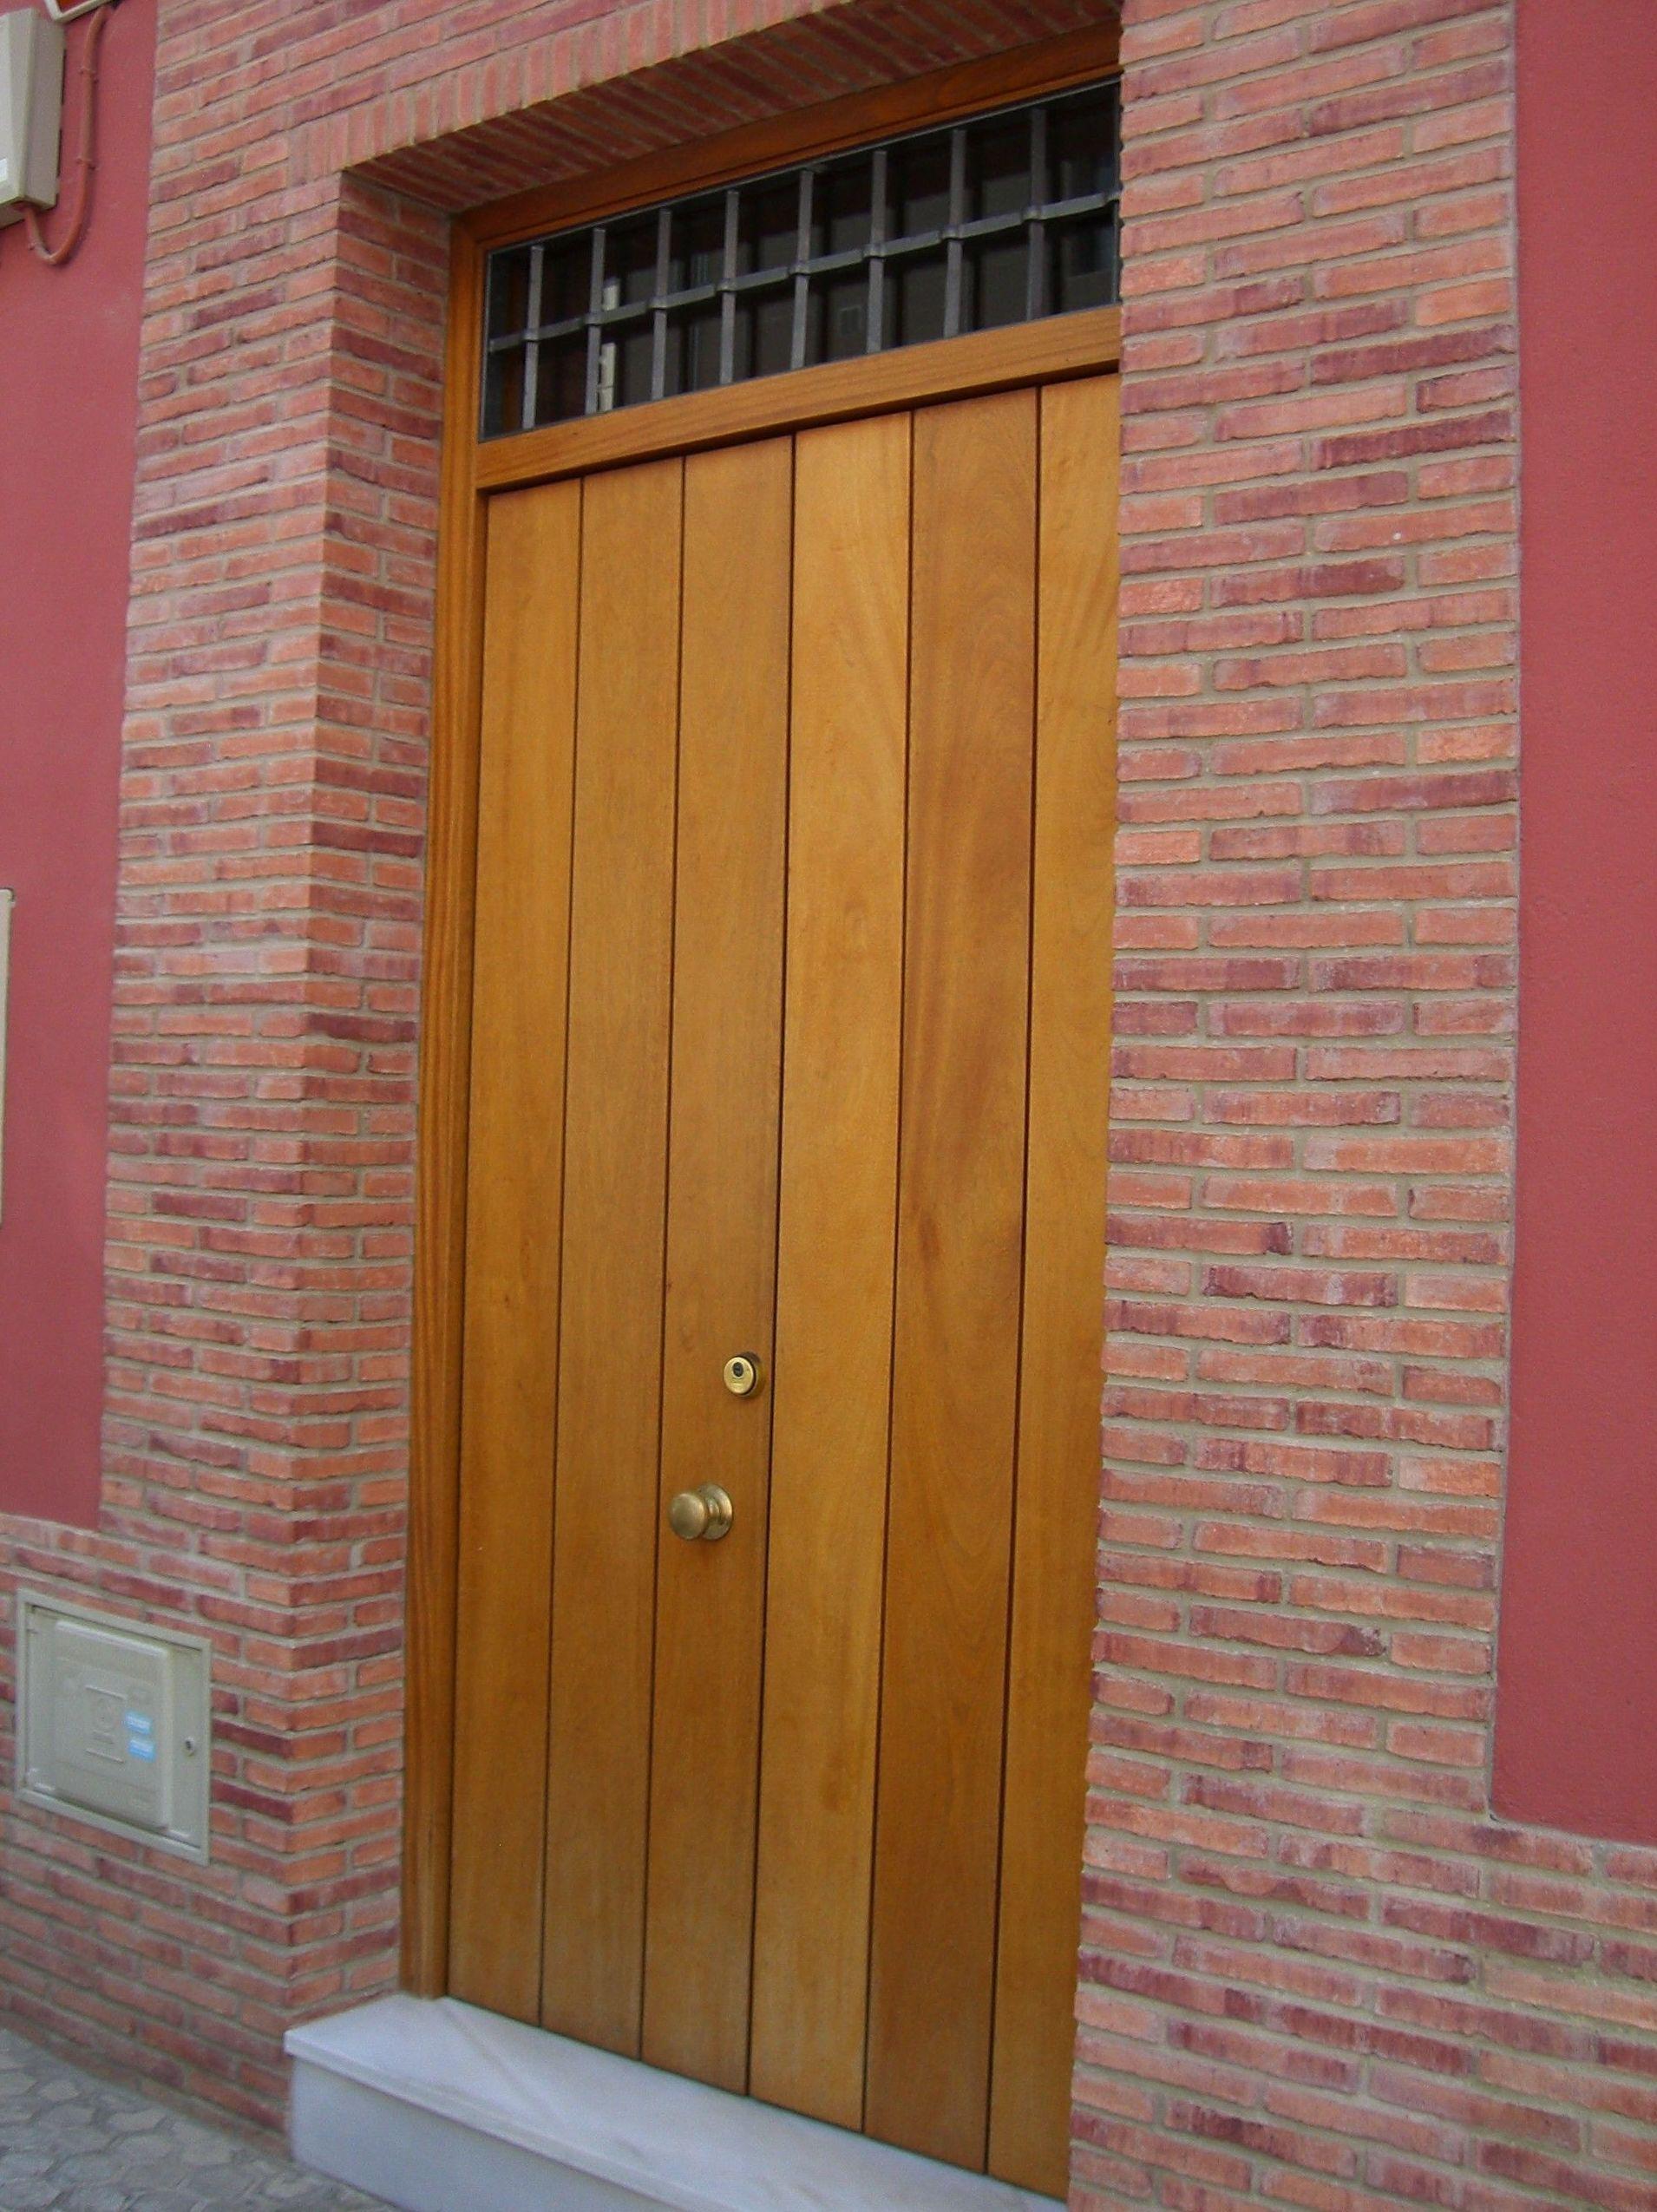 Foto 30 de Carpintería en Alcalá de Guadaíra | CARPINTERÍA Y EBANISTERÍA ARCAMADE